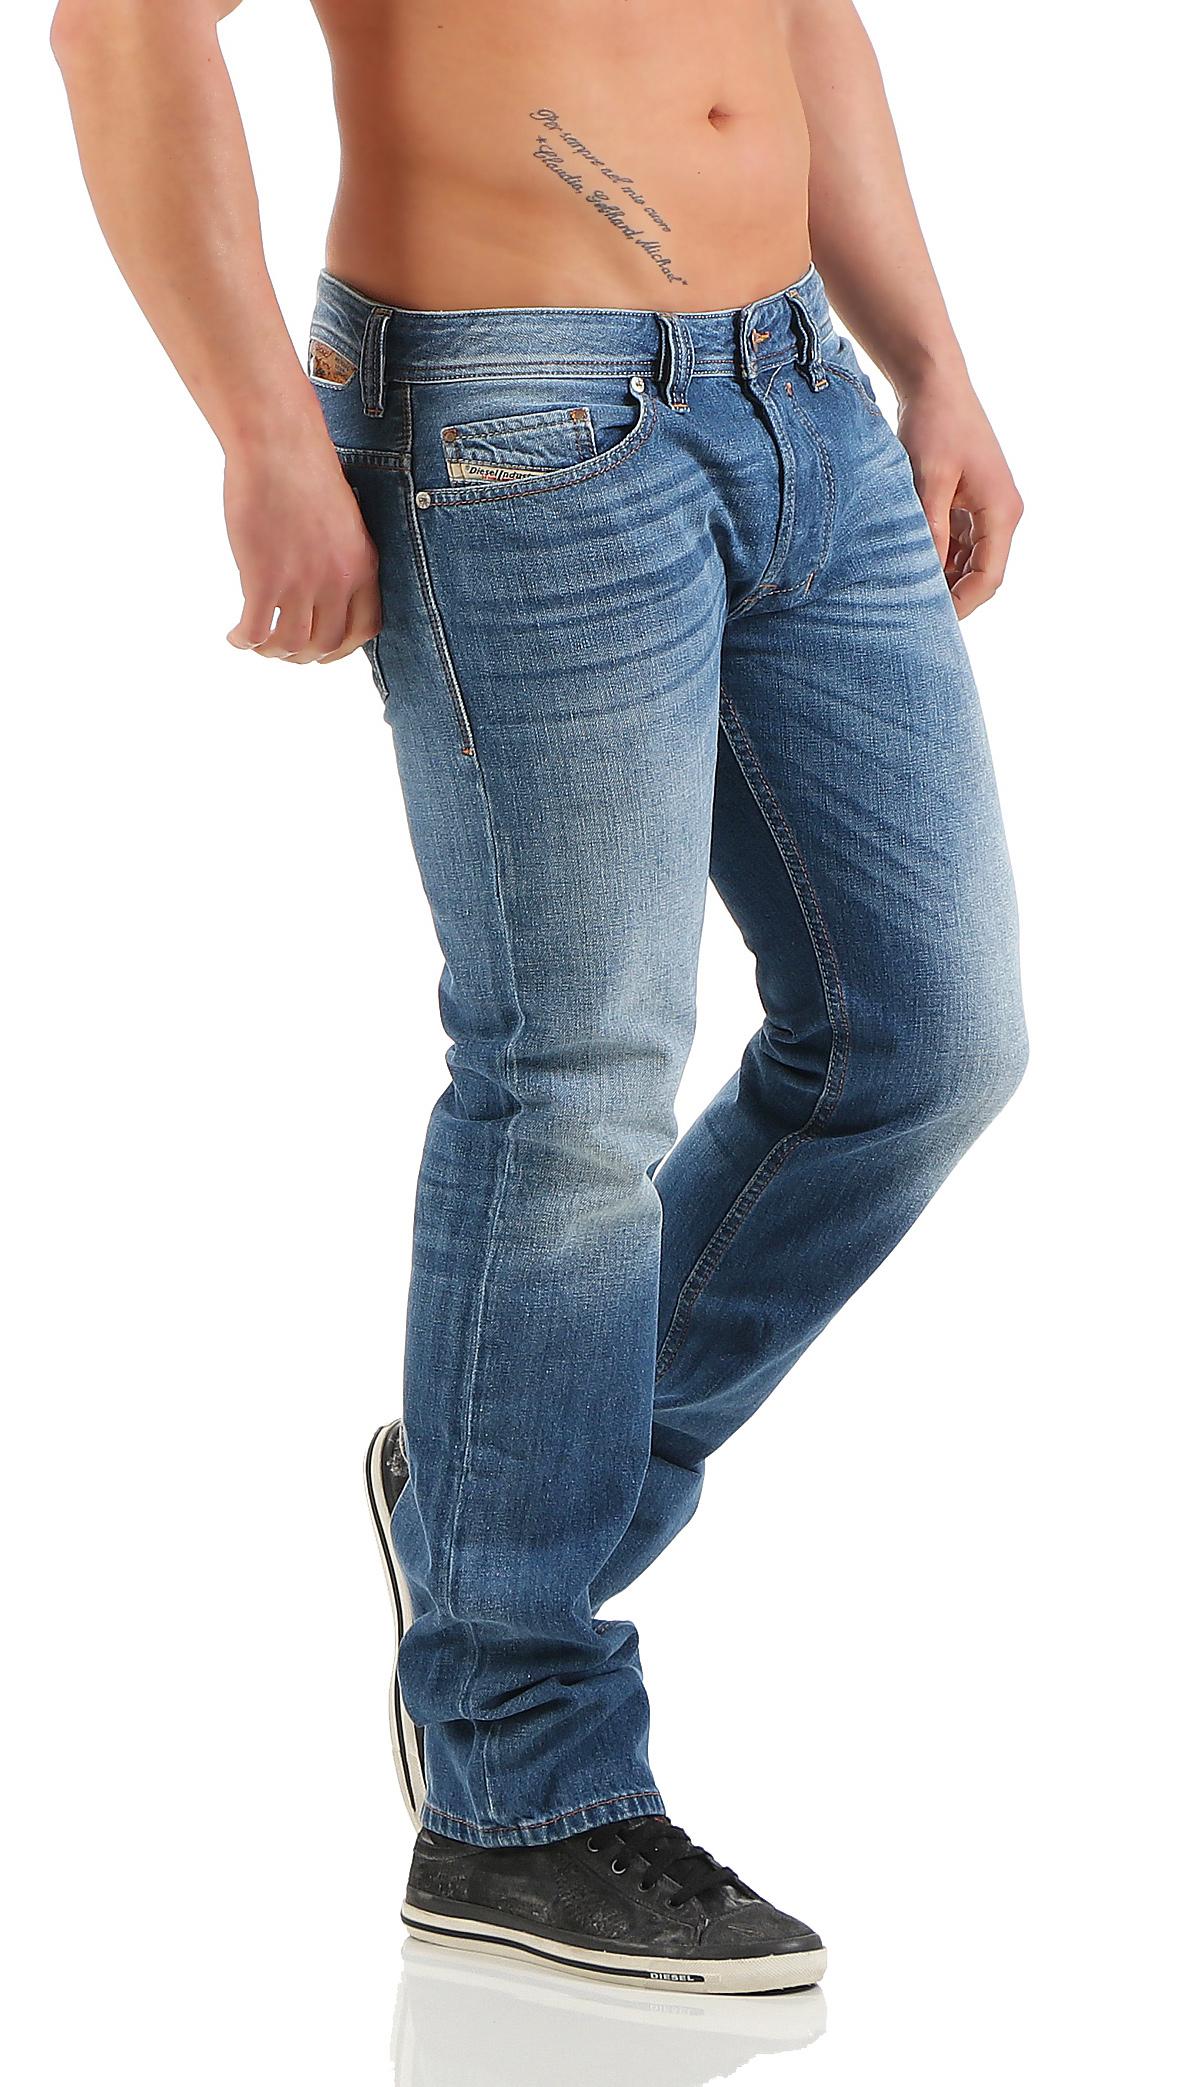 diesel jeans safado 0826a 826a pantalon hommes coupe. Black Bedroom Furniture Sets. Home Design Ideas